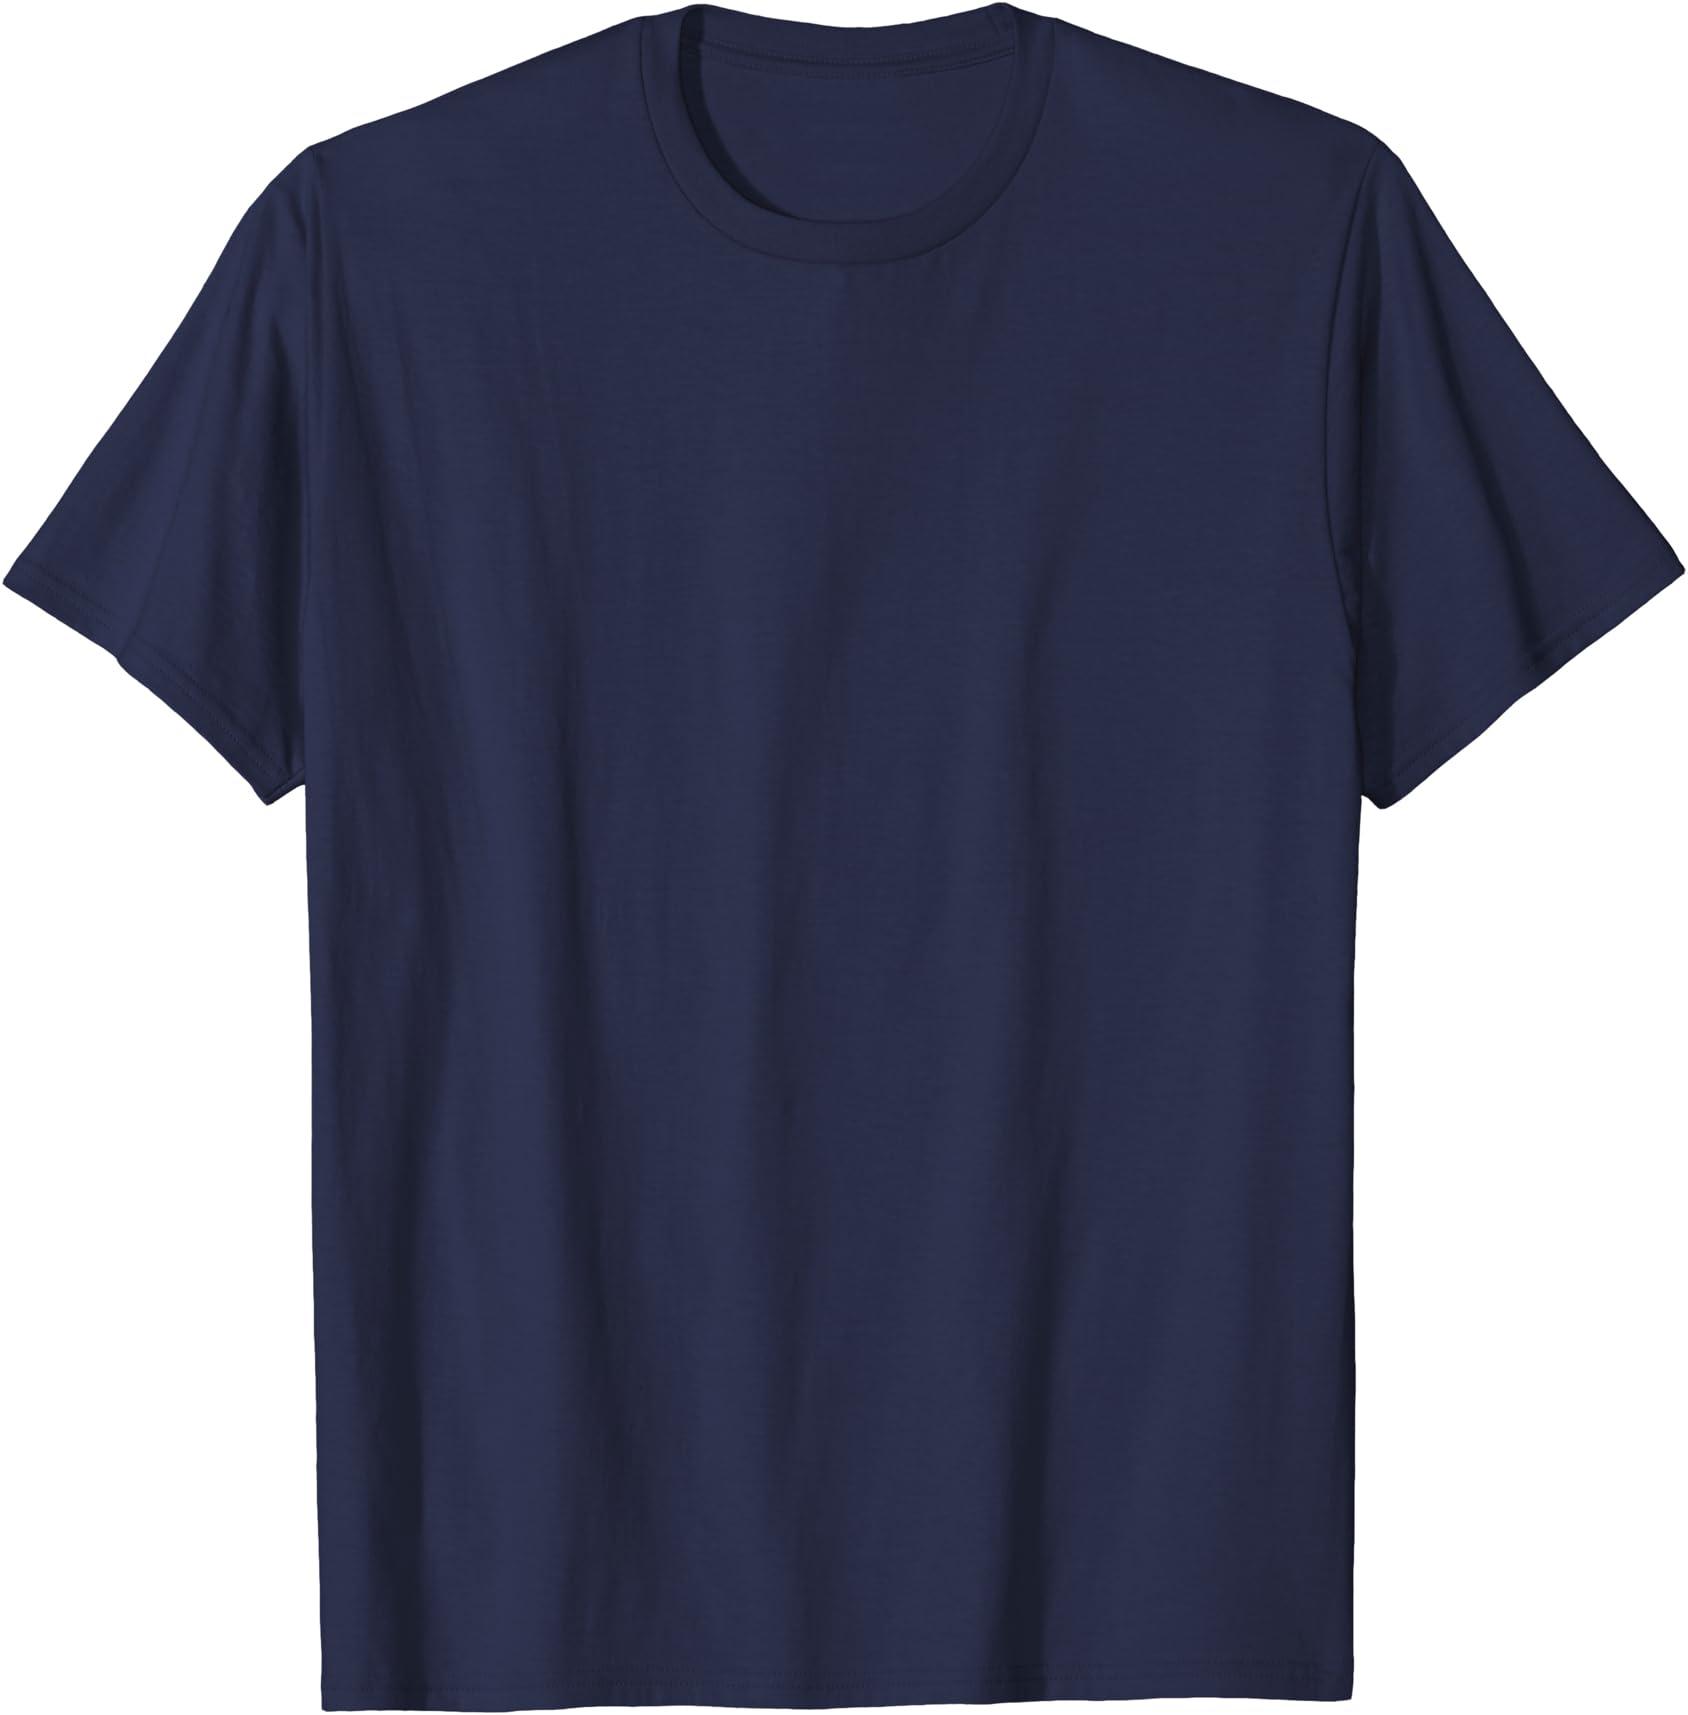 Hunter 23 T-Shirts